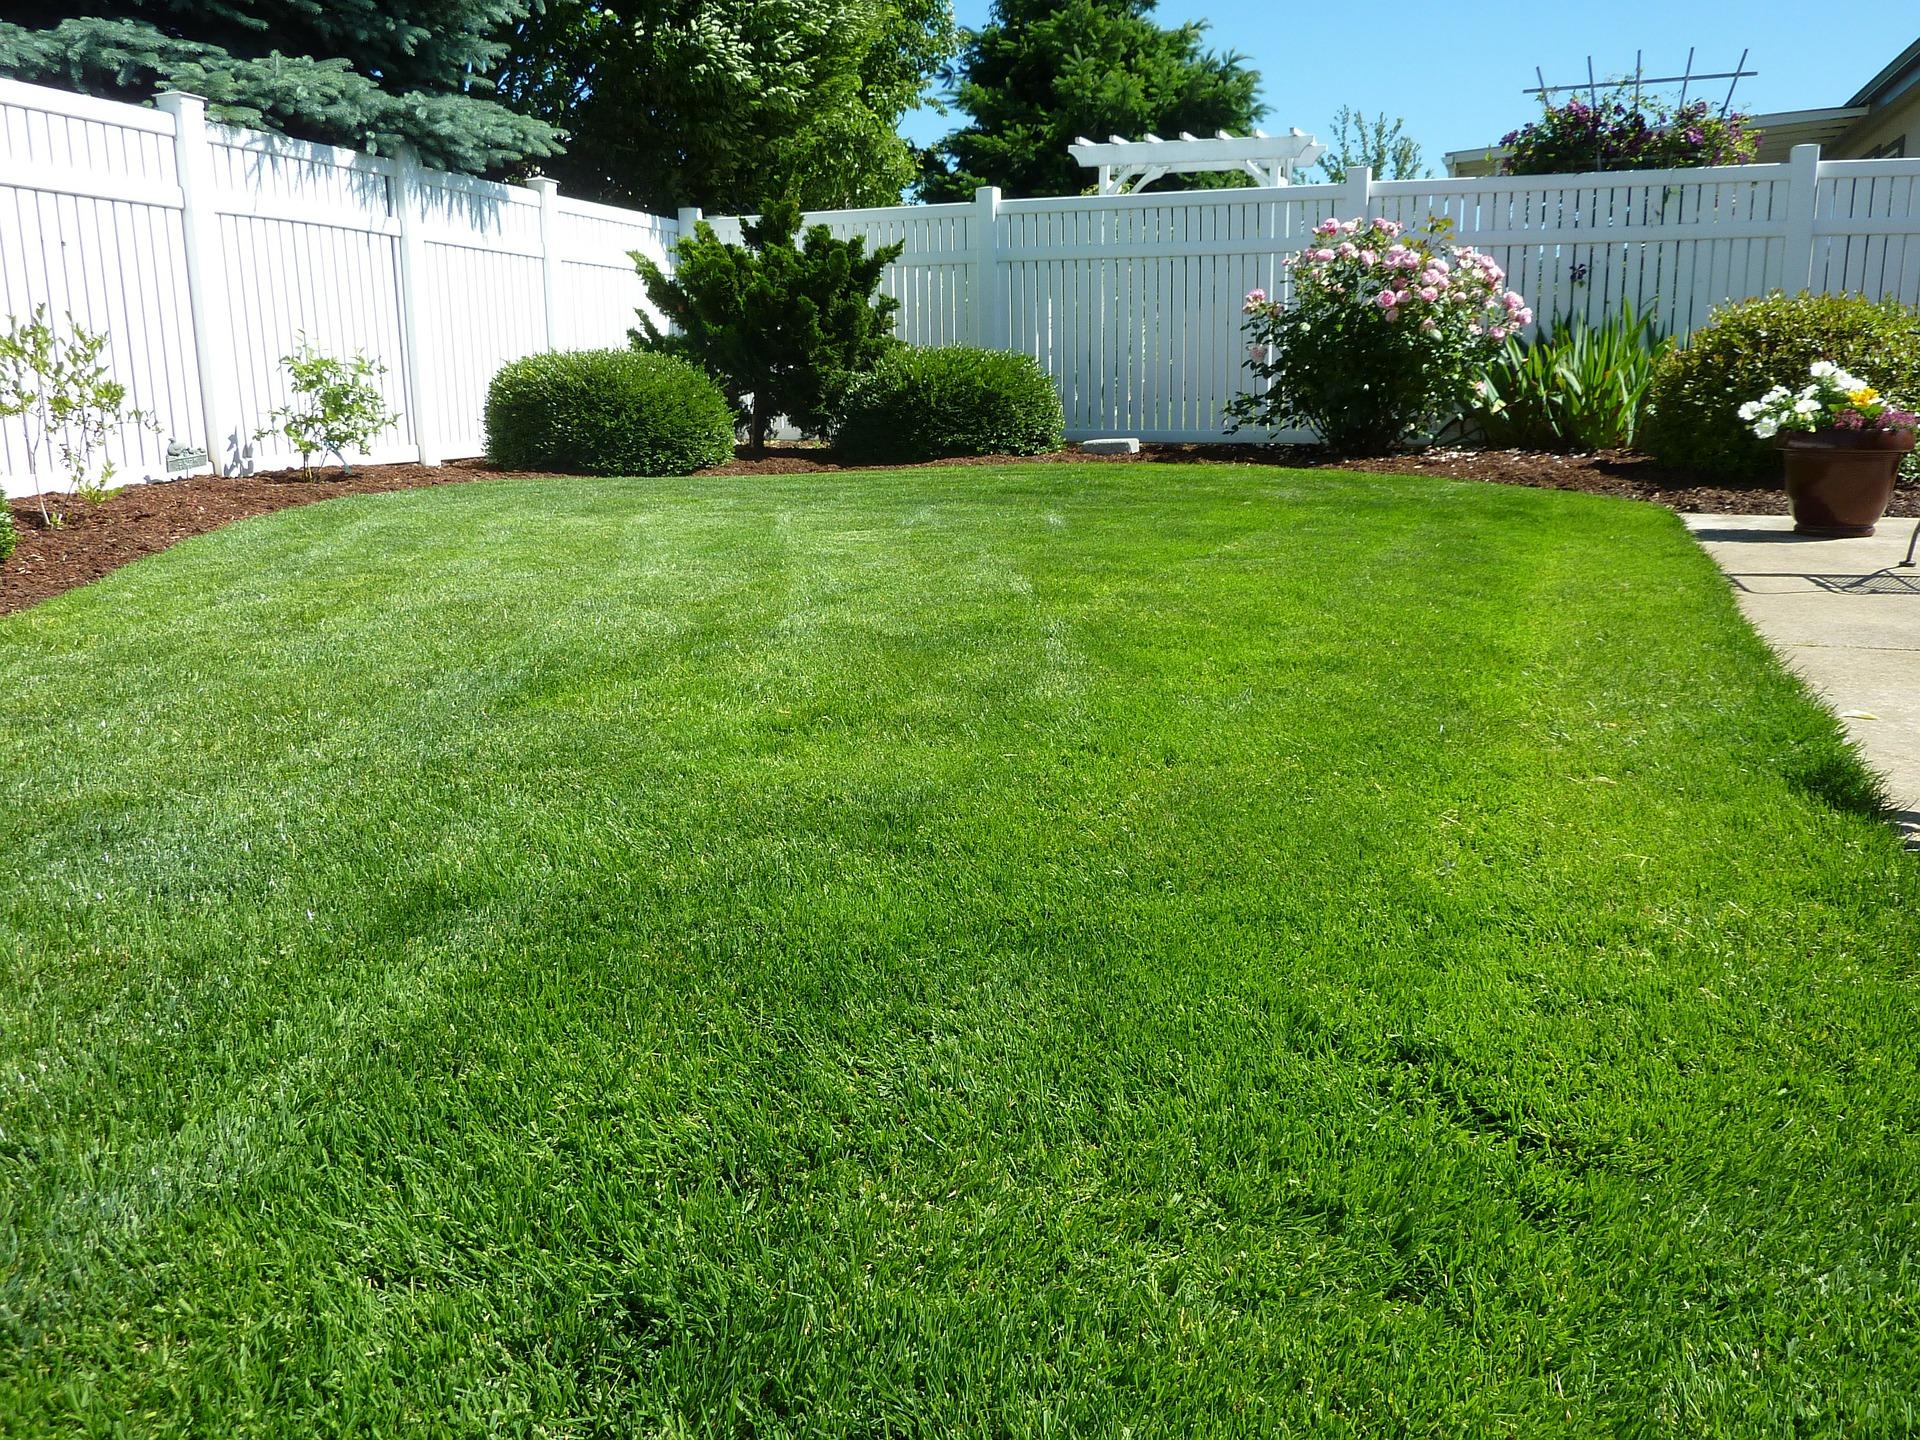 Marvelous How Important Is Phosphorus To My Lawn In Marietta, Georgia?